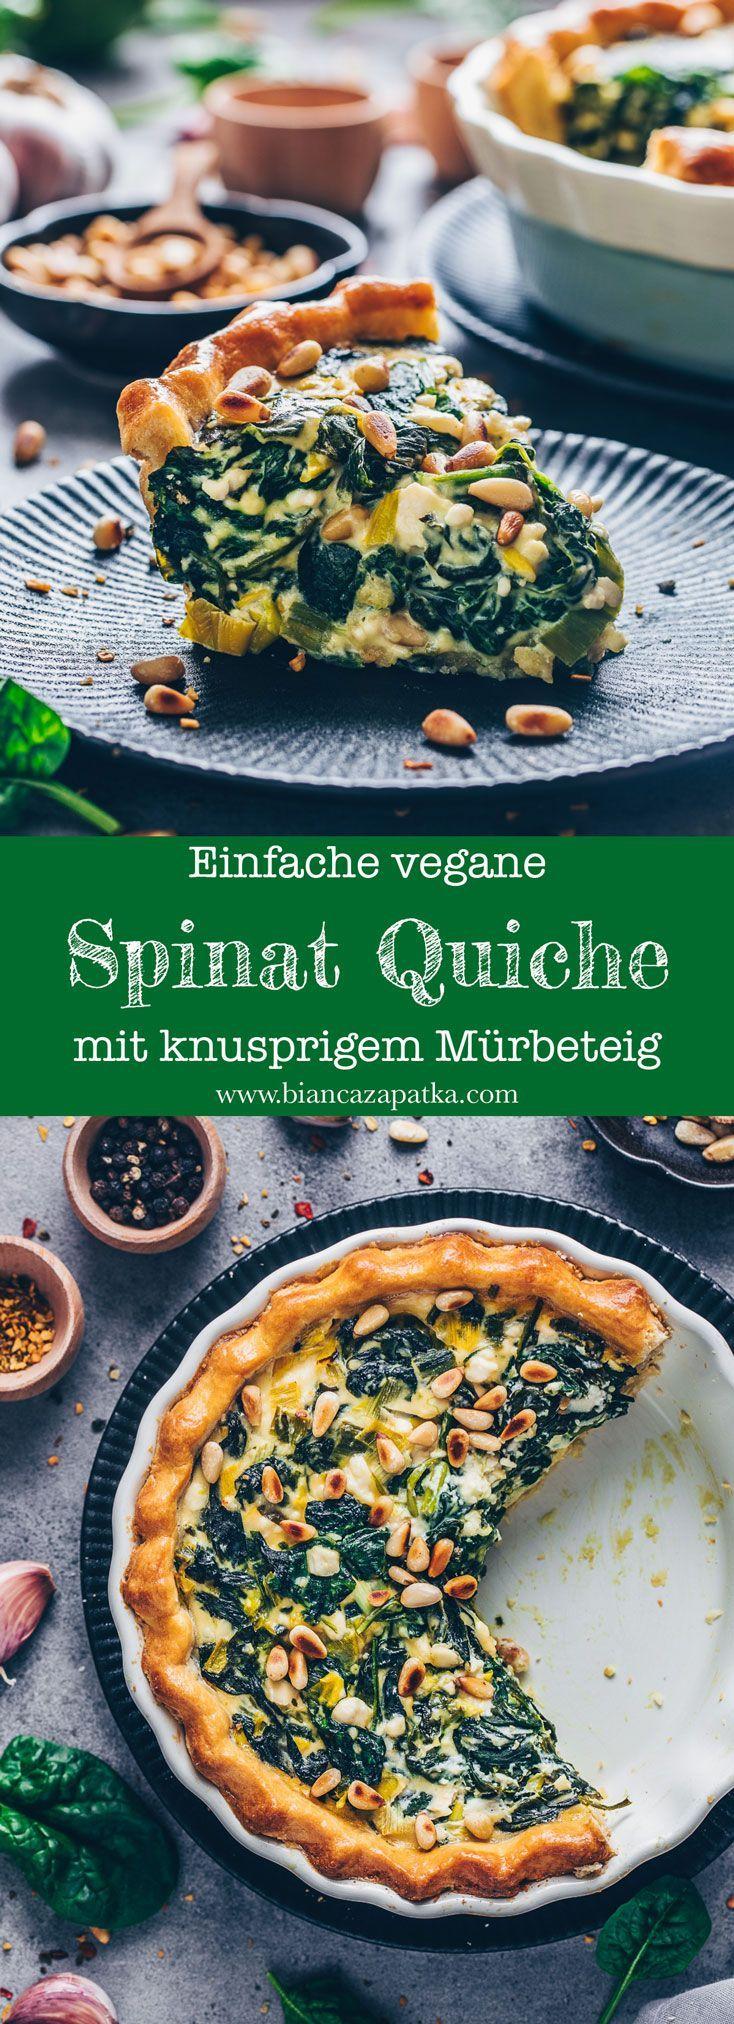 Vegane Spinat Quiche Rezept - einfach - Bianca Zapatka | Rezepte